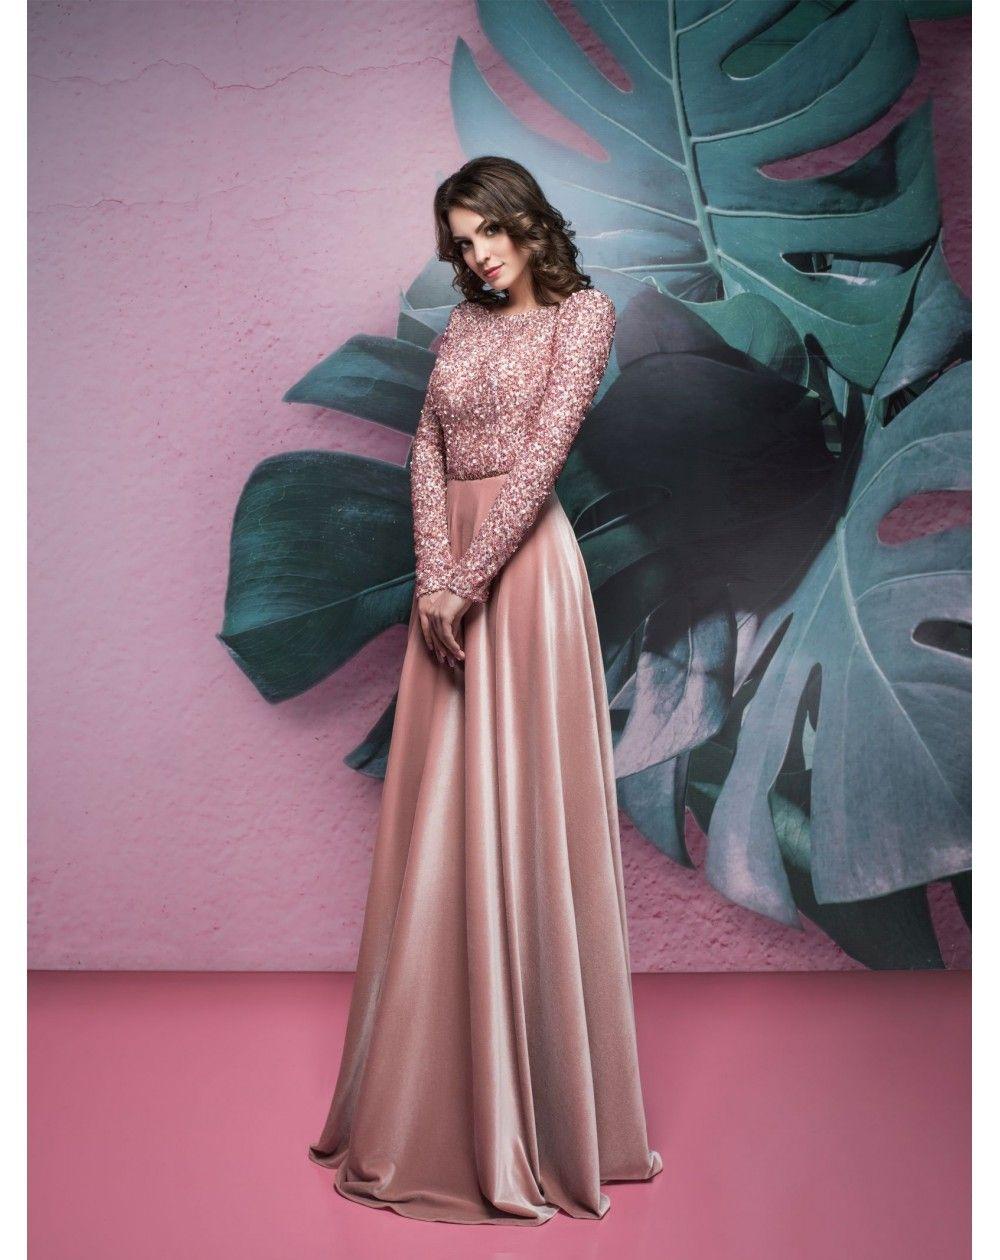 833f07ee613d Luxusné spoločenské šaty so zamatovou dlhou sukňou. Zvršok má dlhé rukávy  je ušitý z exkluzívneho